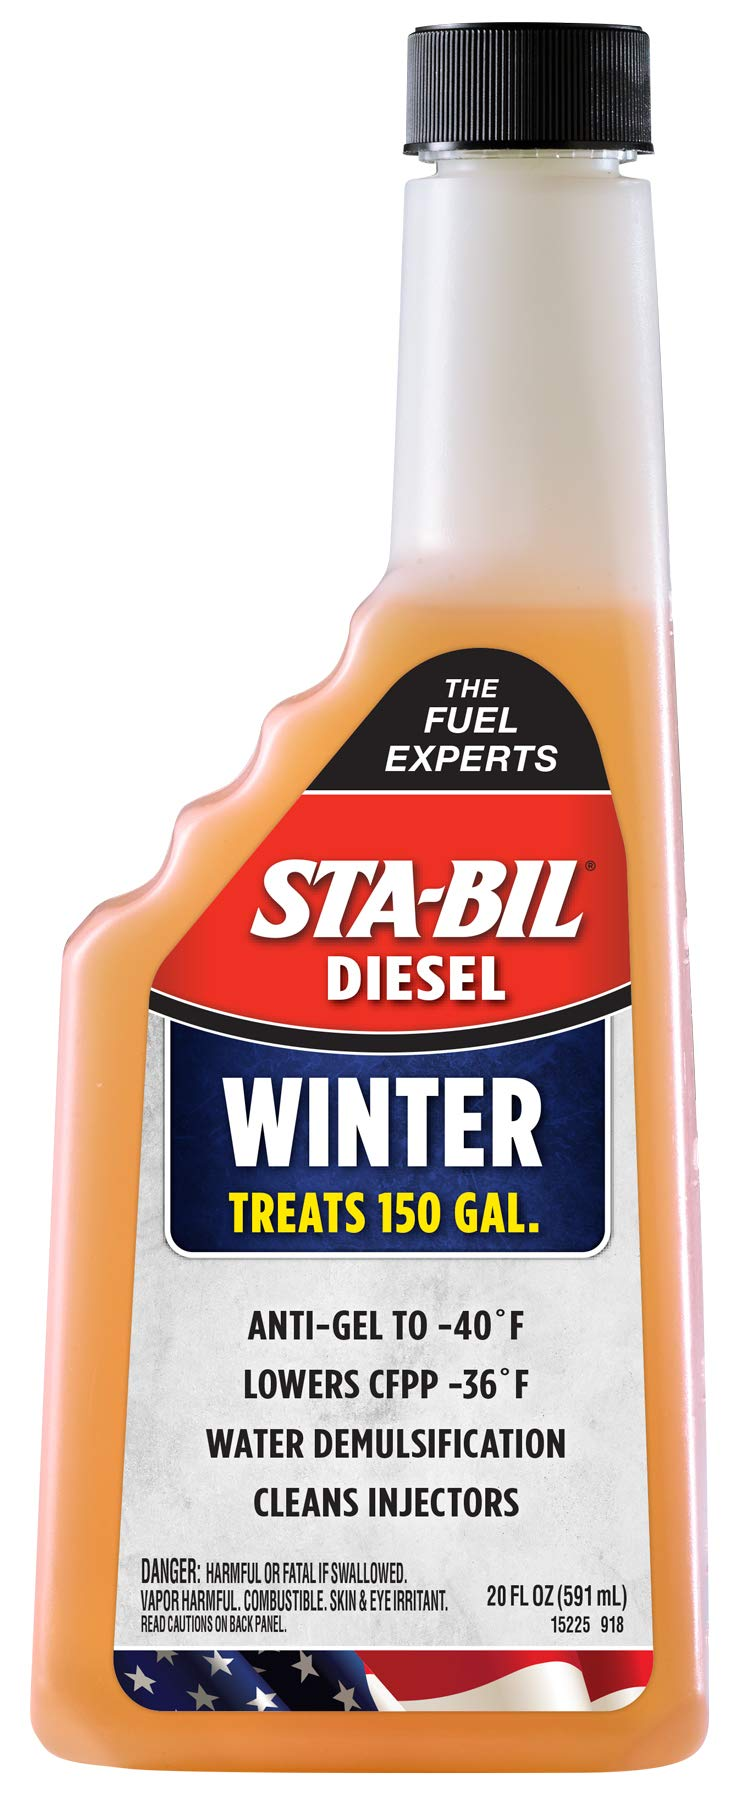 STA-BIL (15225) Diesel Winter Anti-Gel, 20oz by STA-BIL